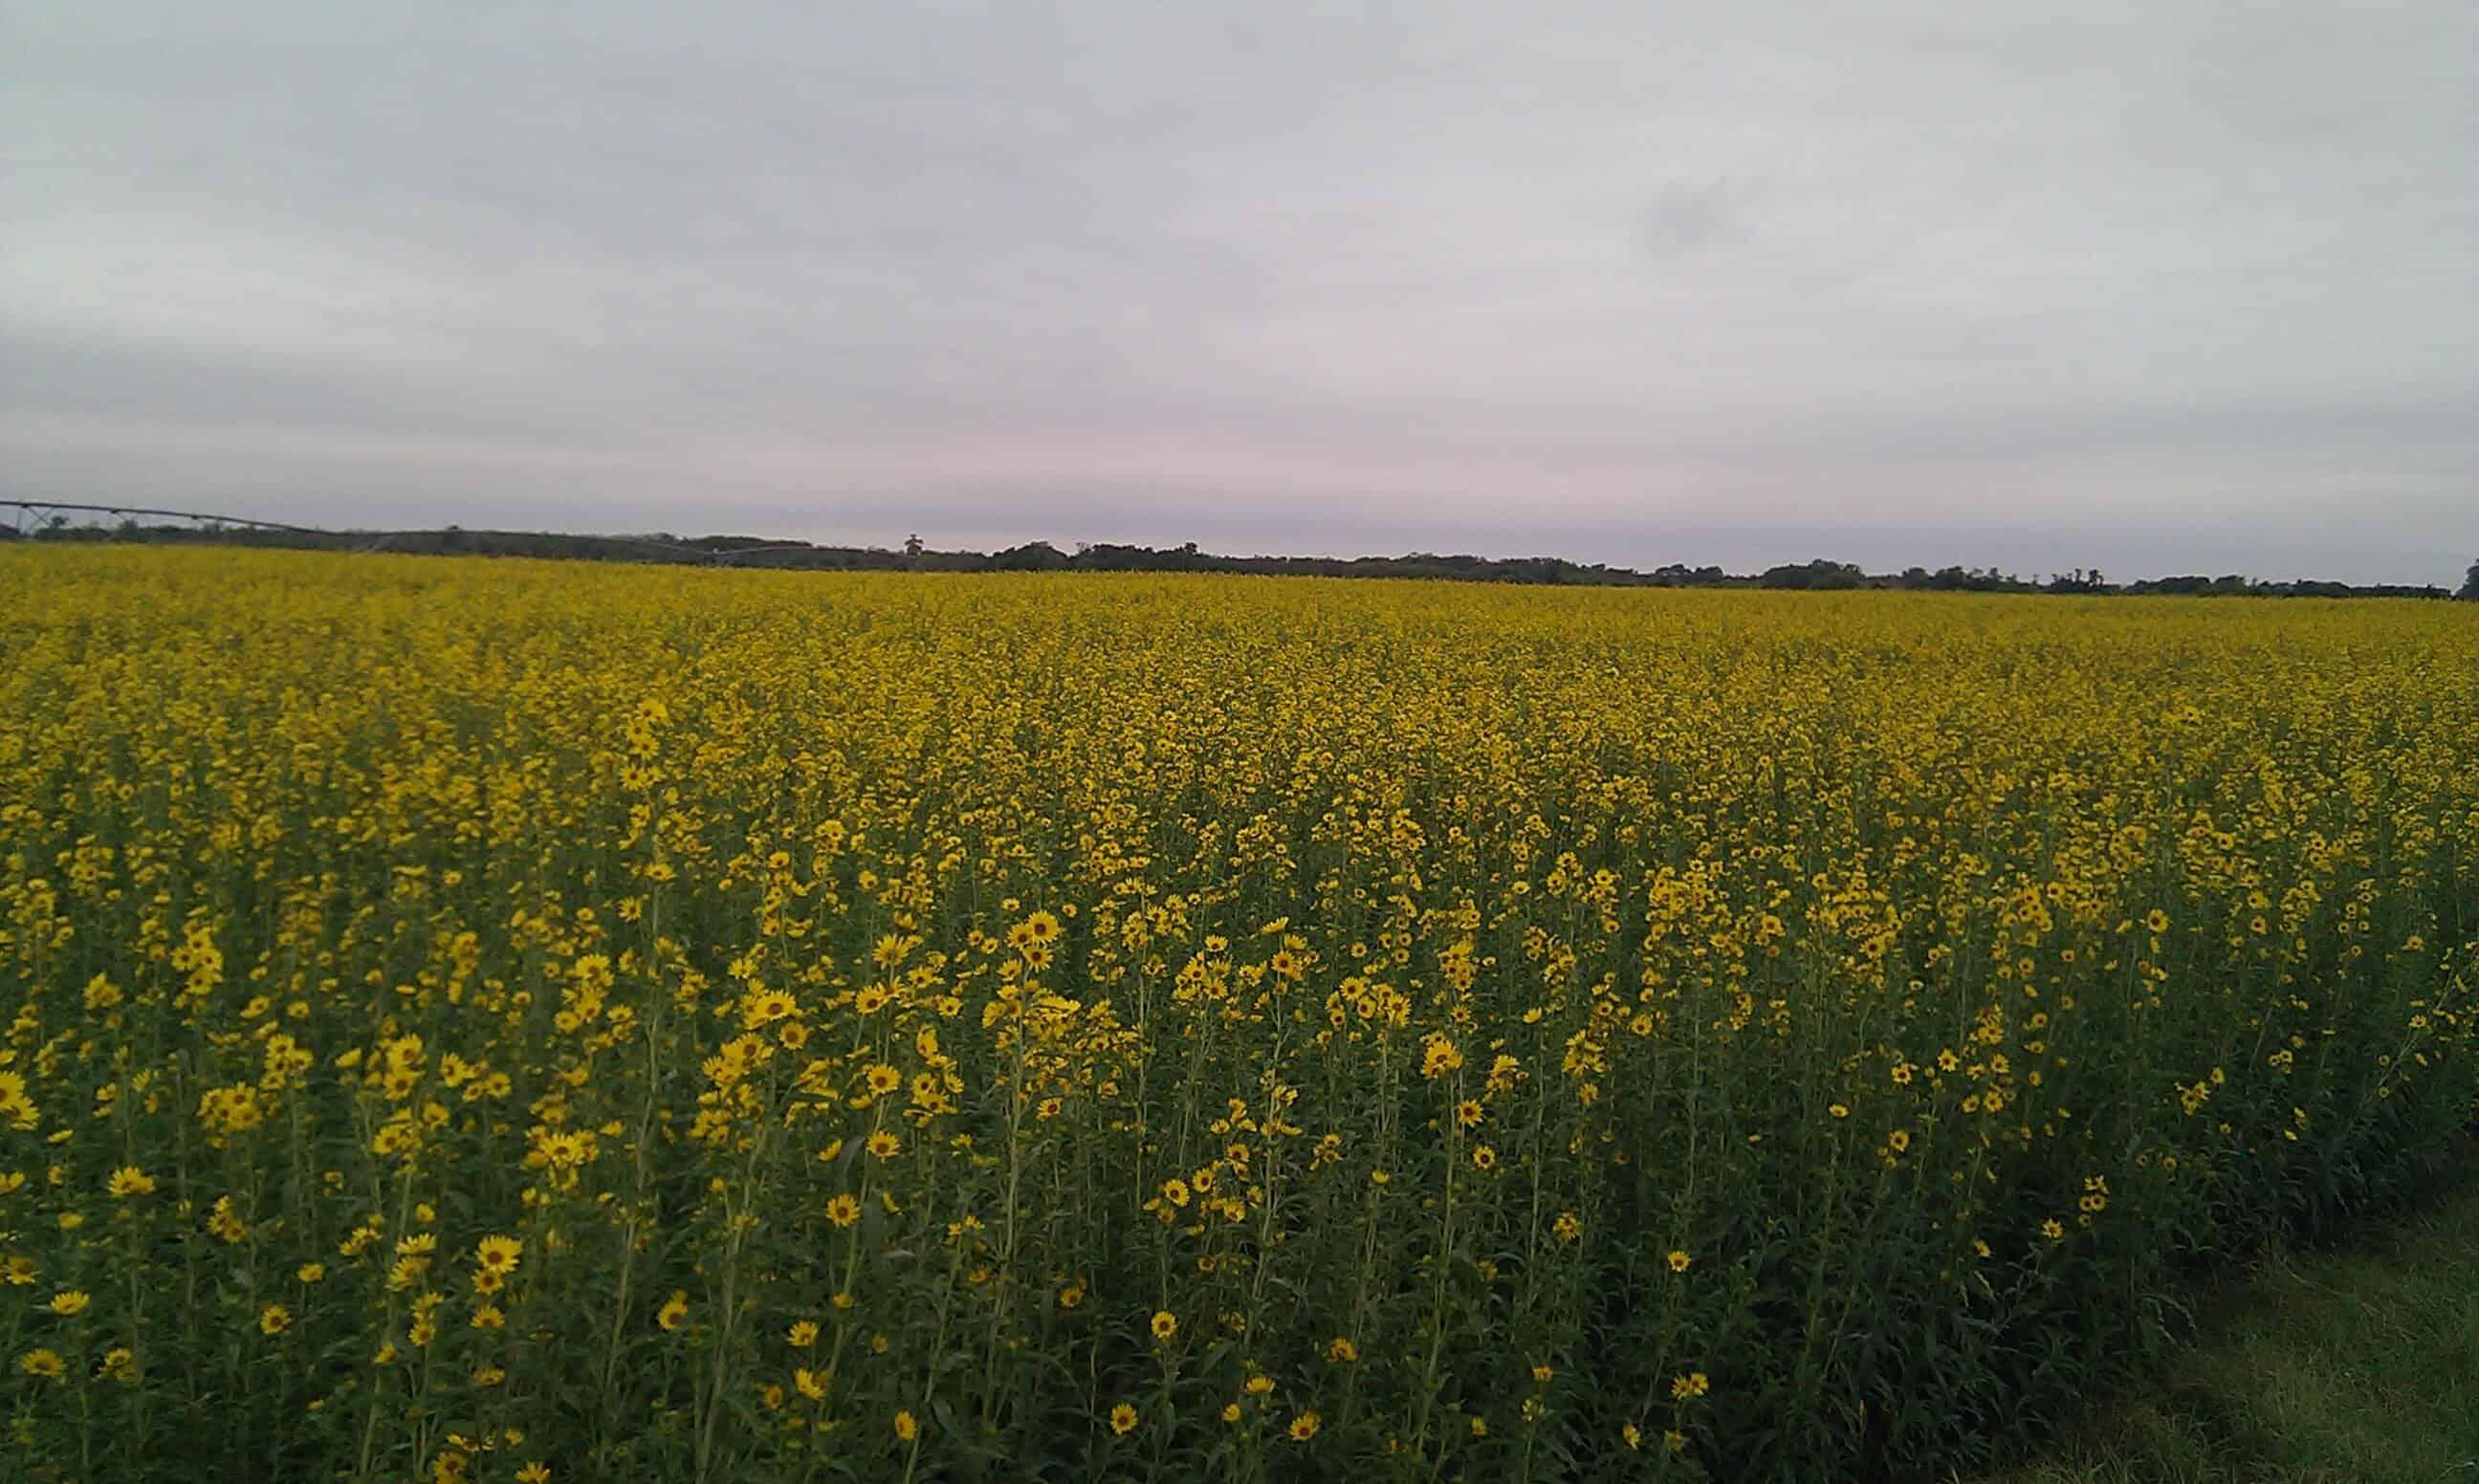 Field of Maximillian Sunflowers